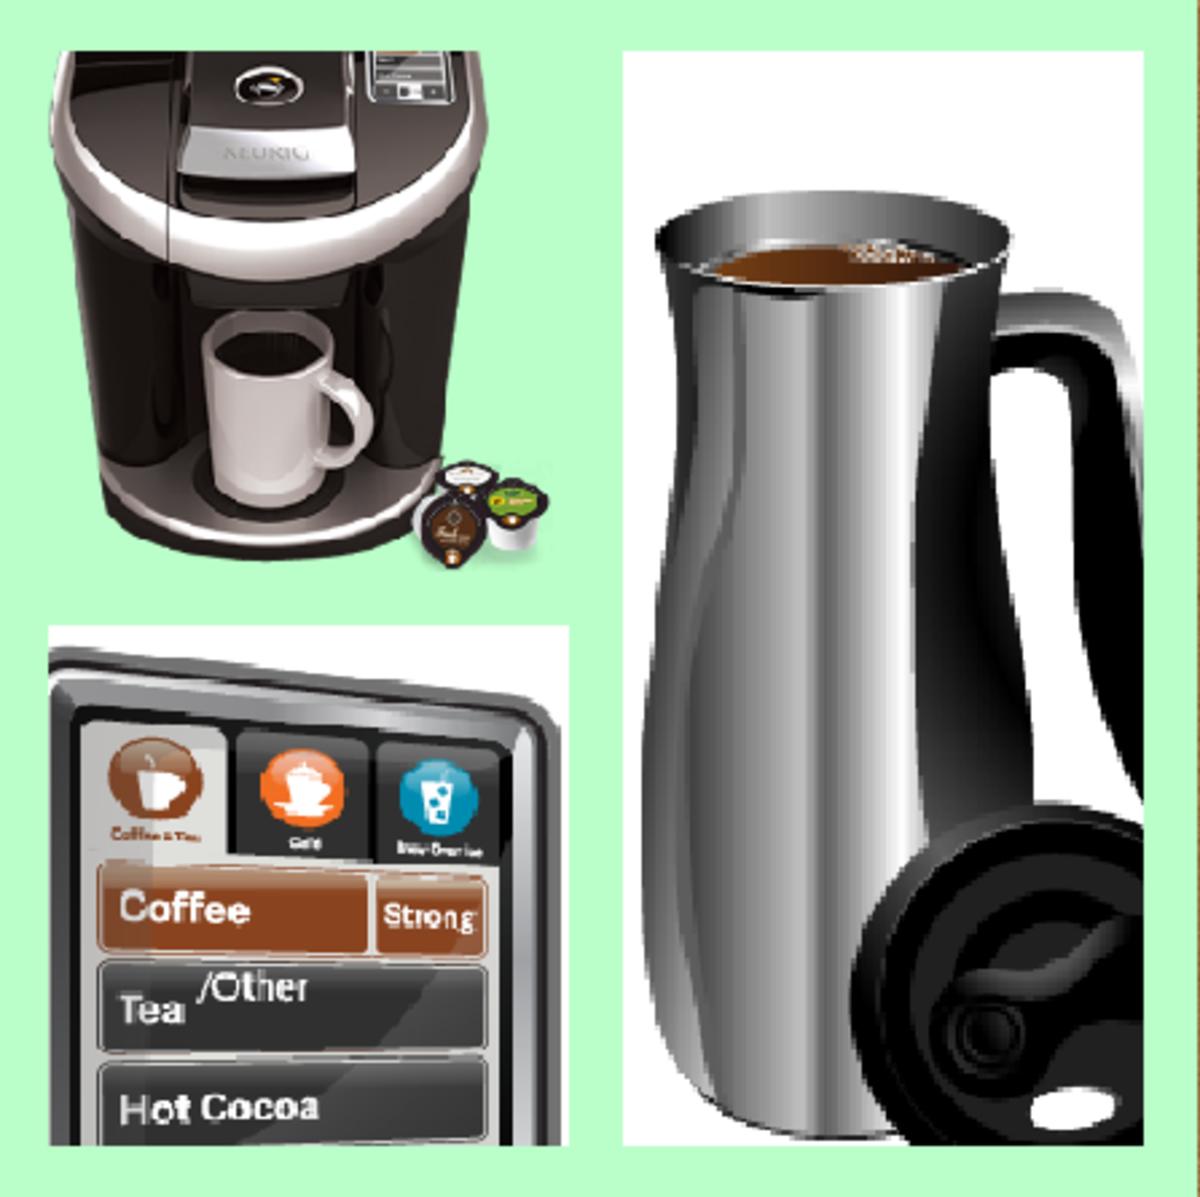 VUE-Coffee